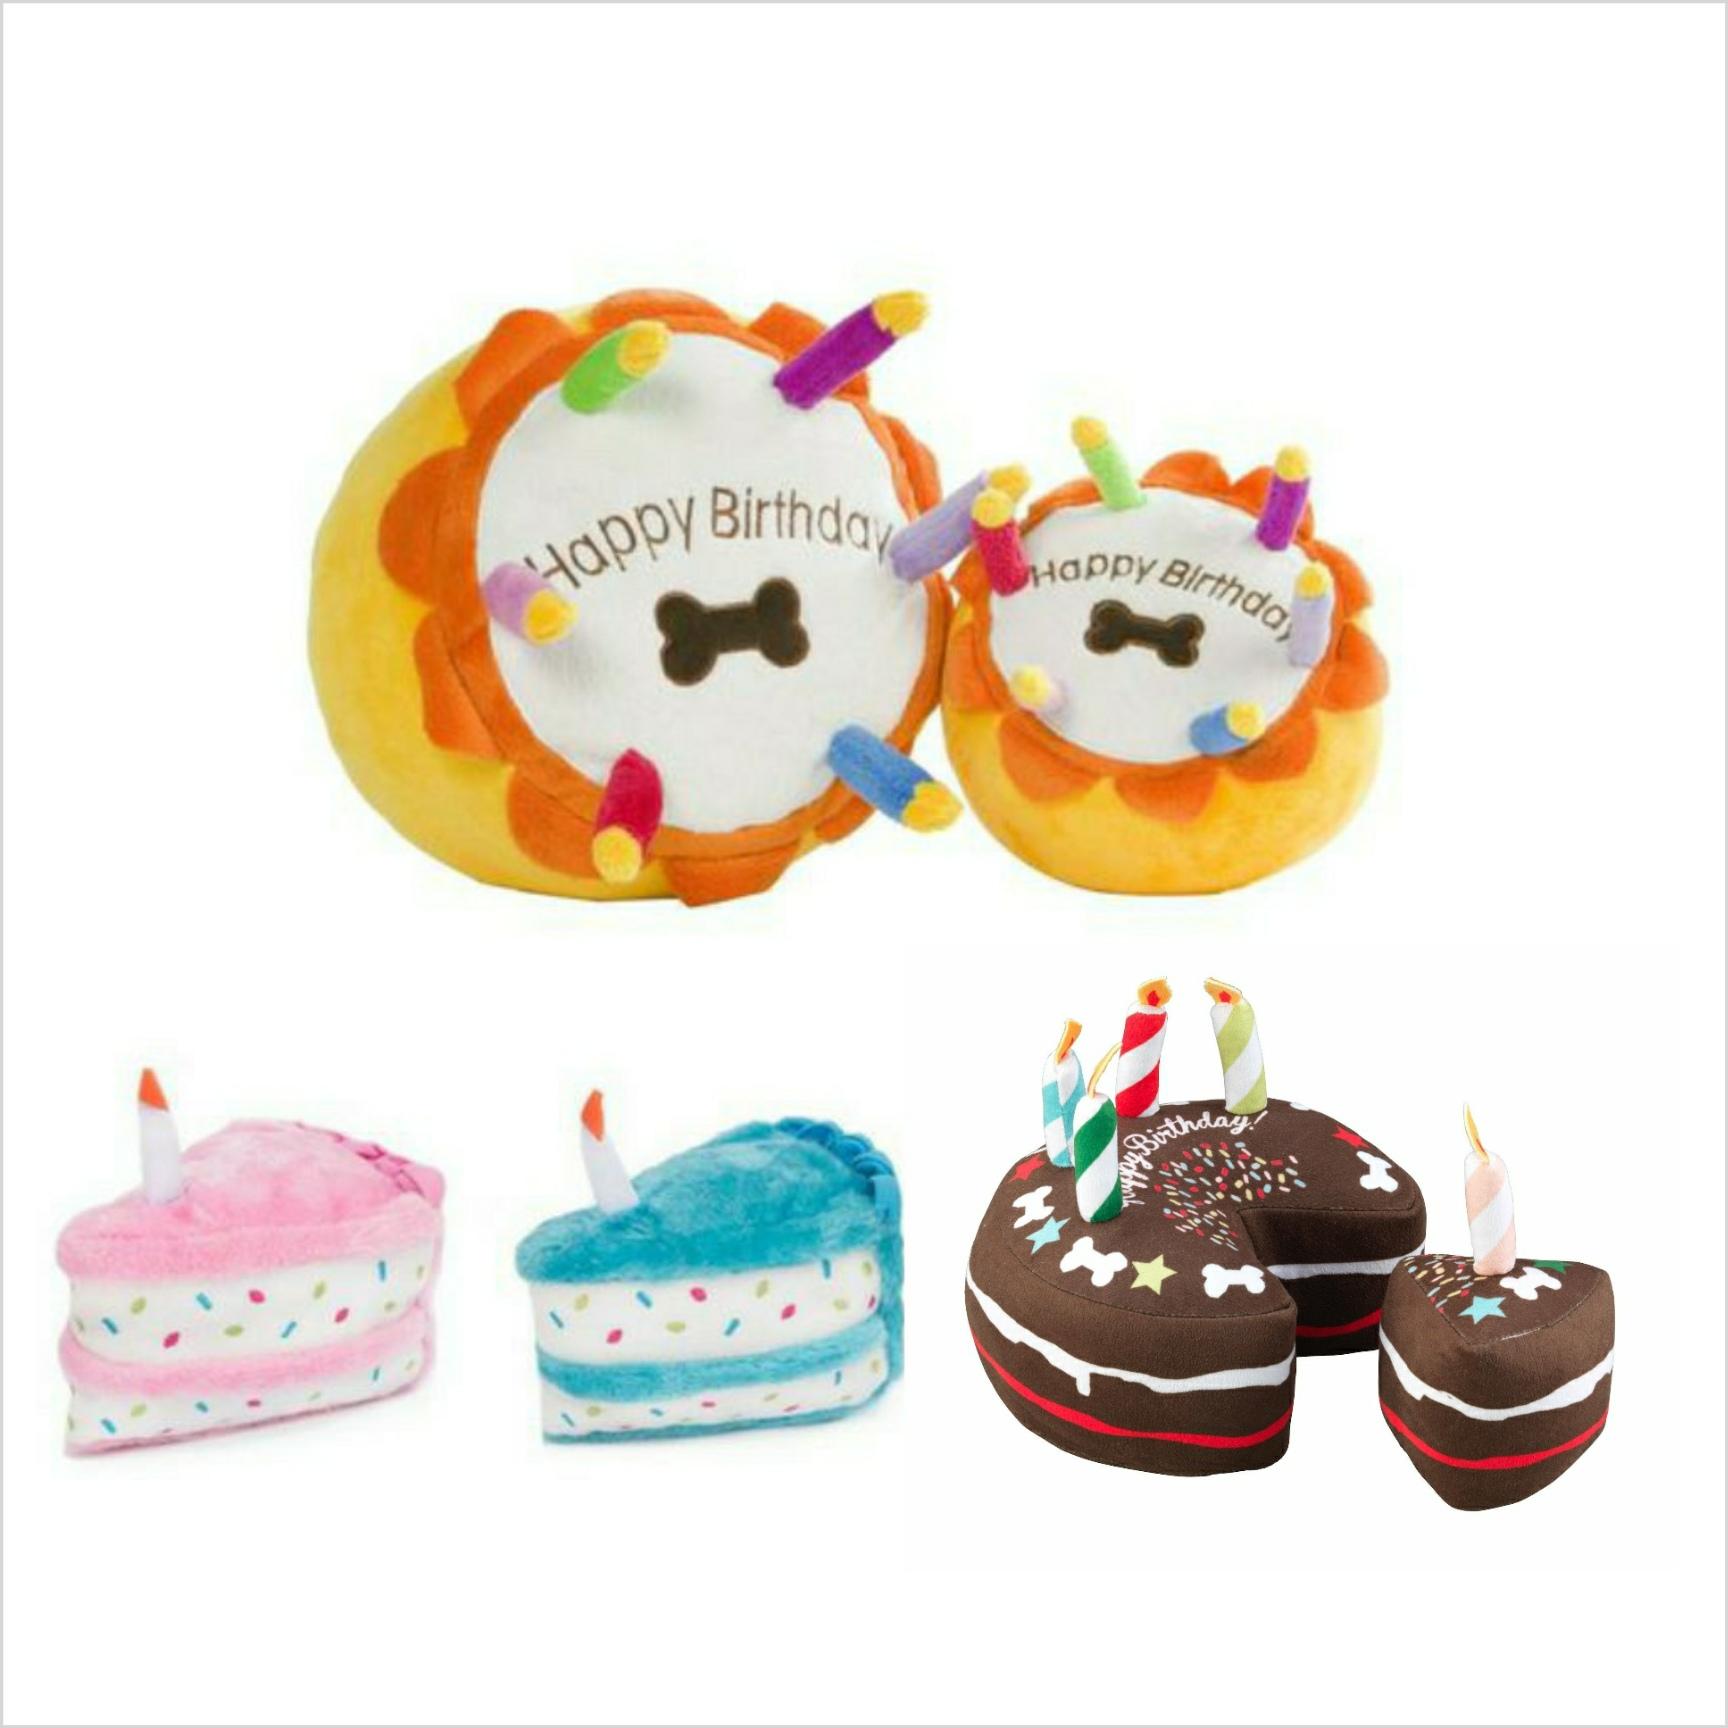 Peachy Celebration Birthday Cake Dog Toys Dogs Co Funny Birthday Cards Online Alyptdamsfinfo